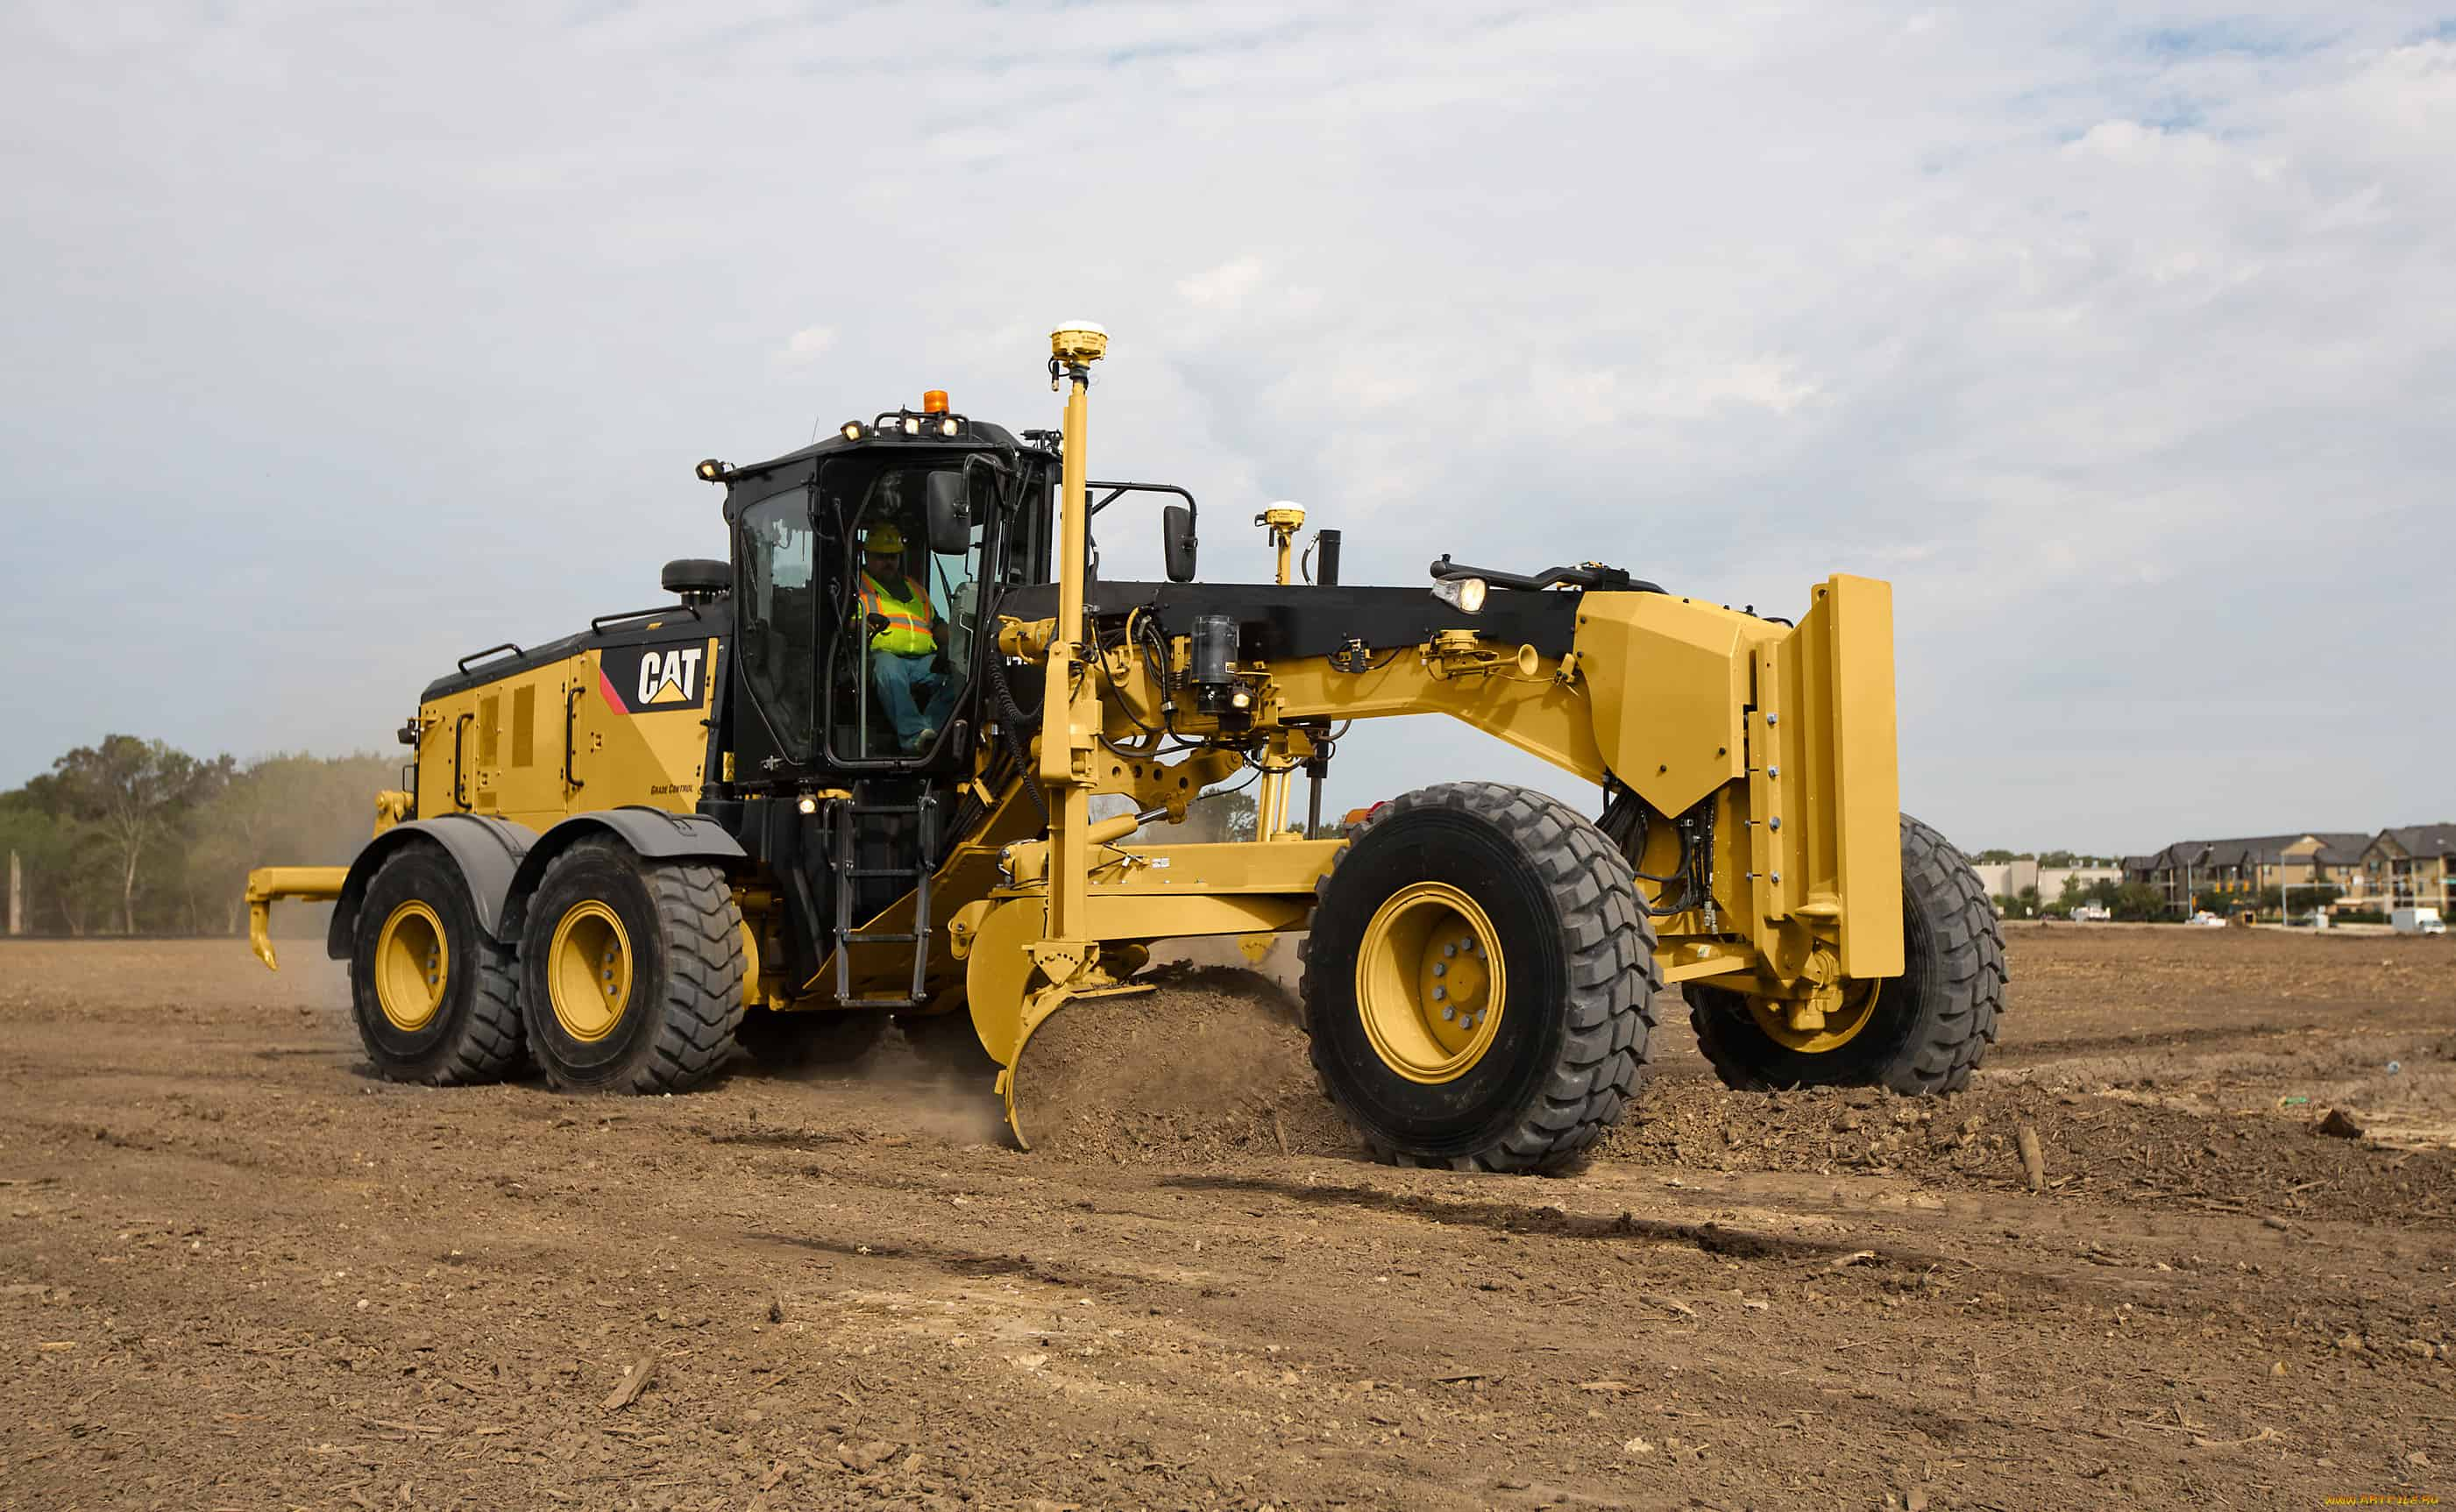 Caterpillar 160 - 20,6 тонн в аренду